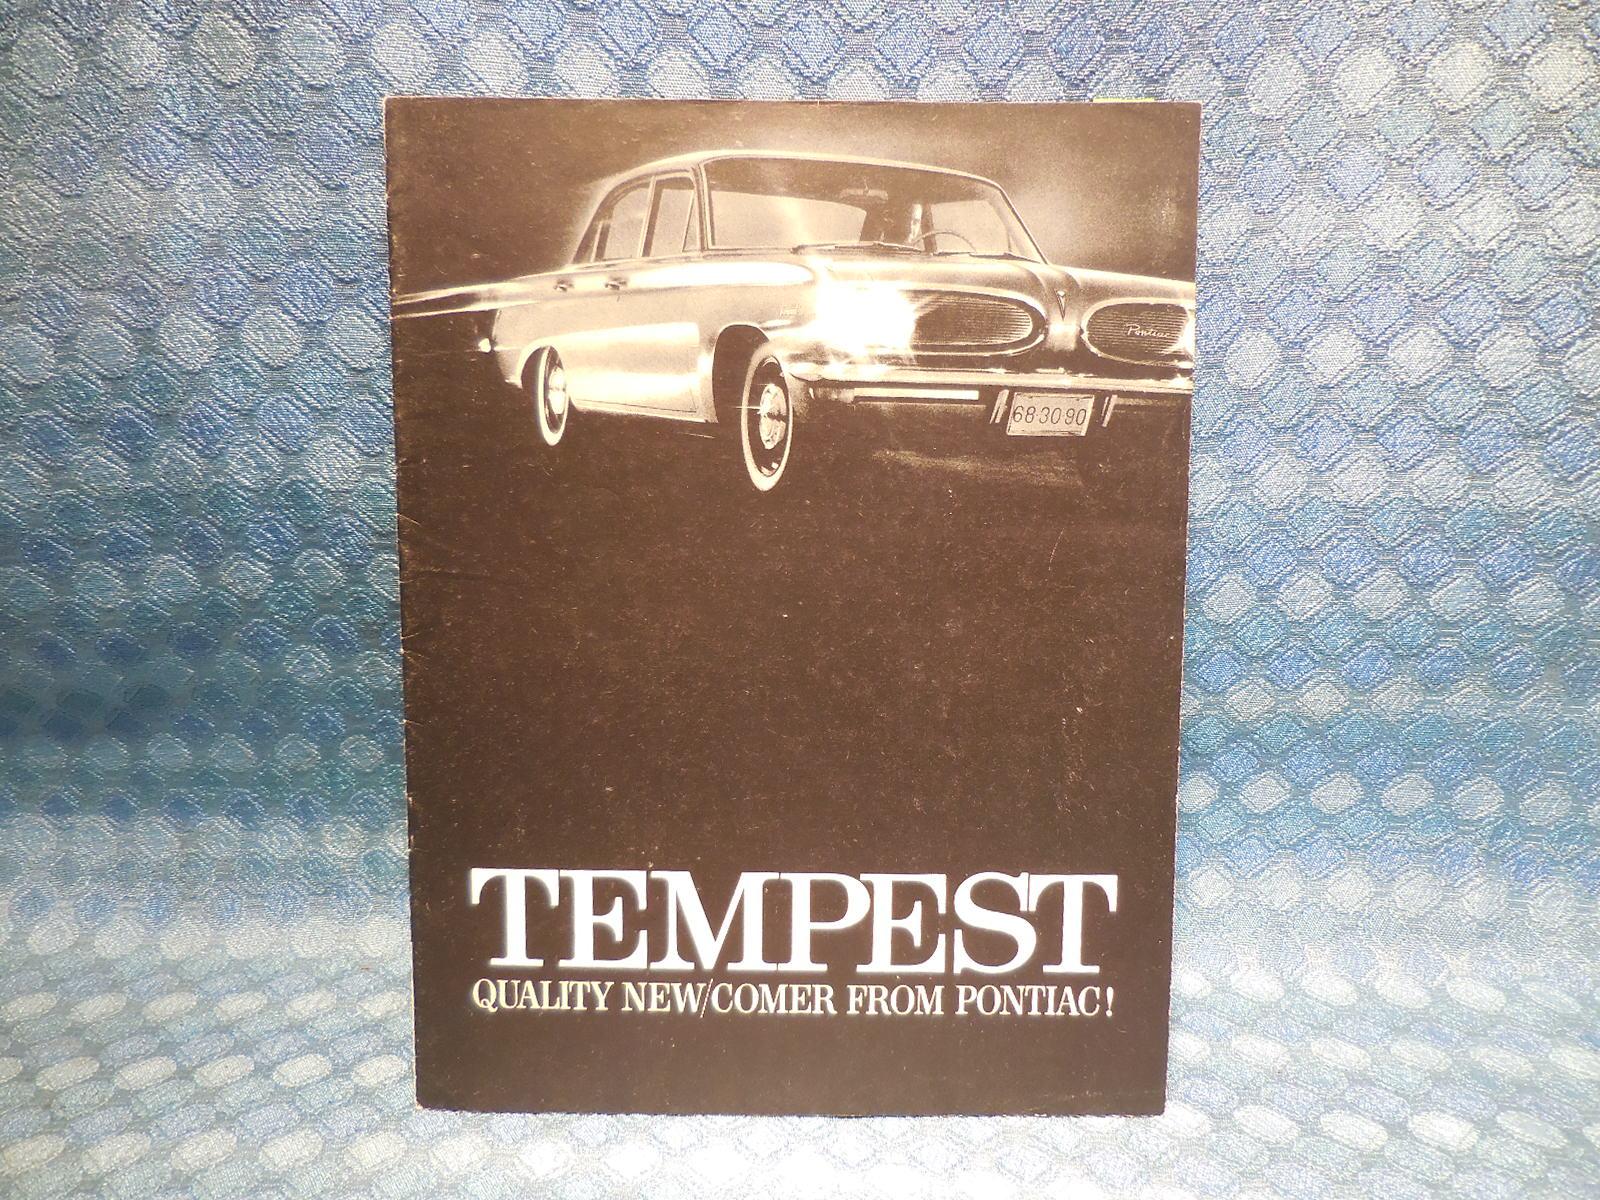 1961 Pontiac Tempest Original Sales Brochure Nos Texas Parts Llc 48 Ford Sedan Wiring Diagram Antique Auto